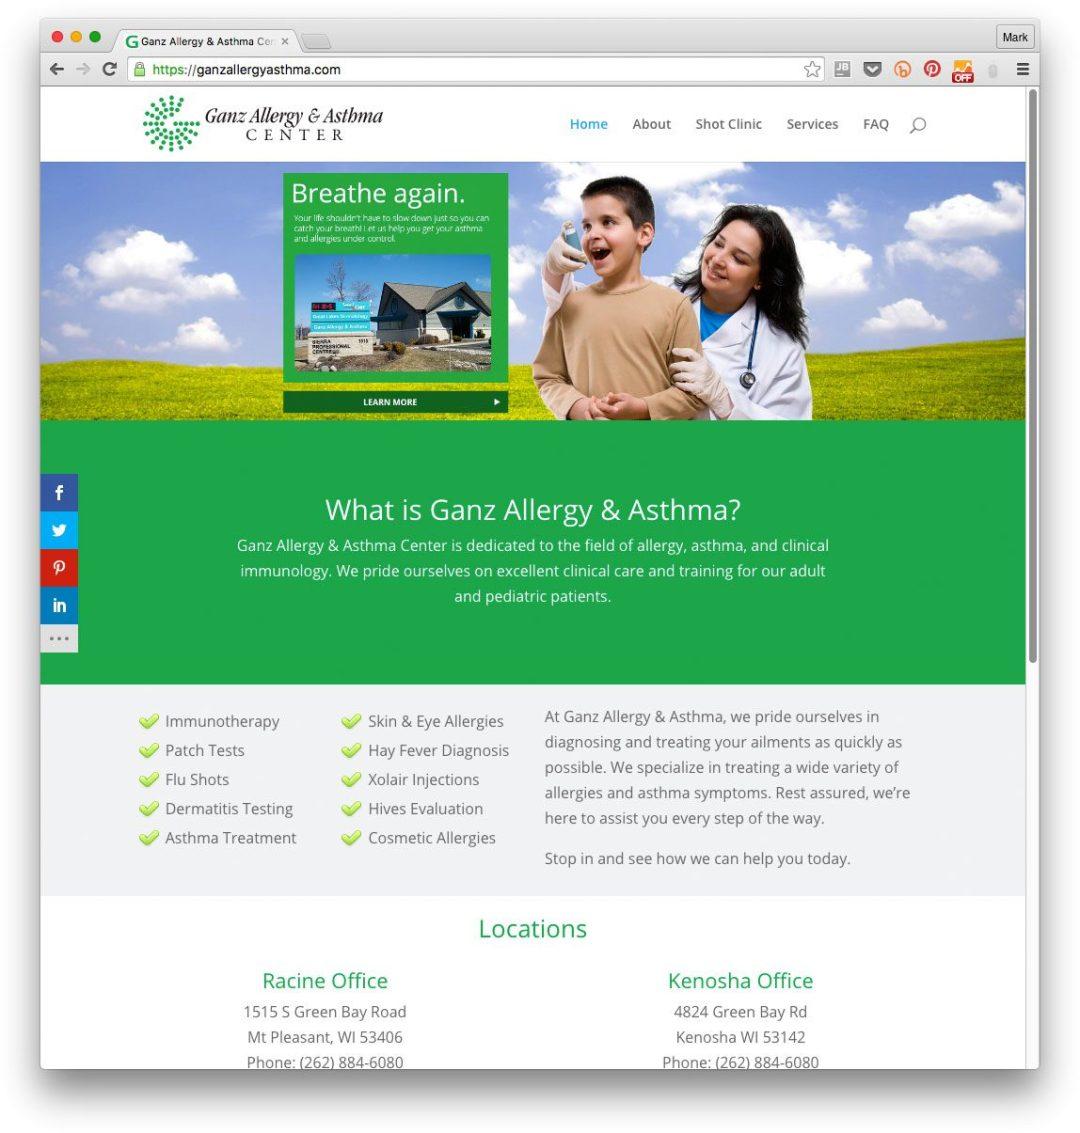 Website example: Ganz Allergy & Asthma Center